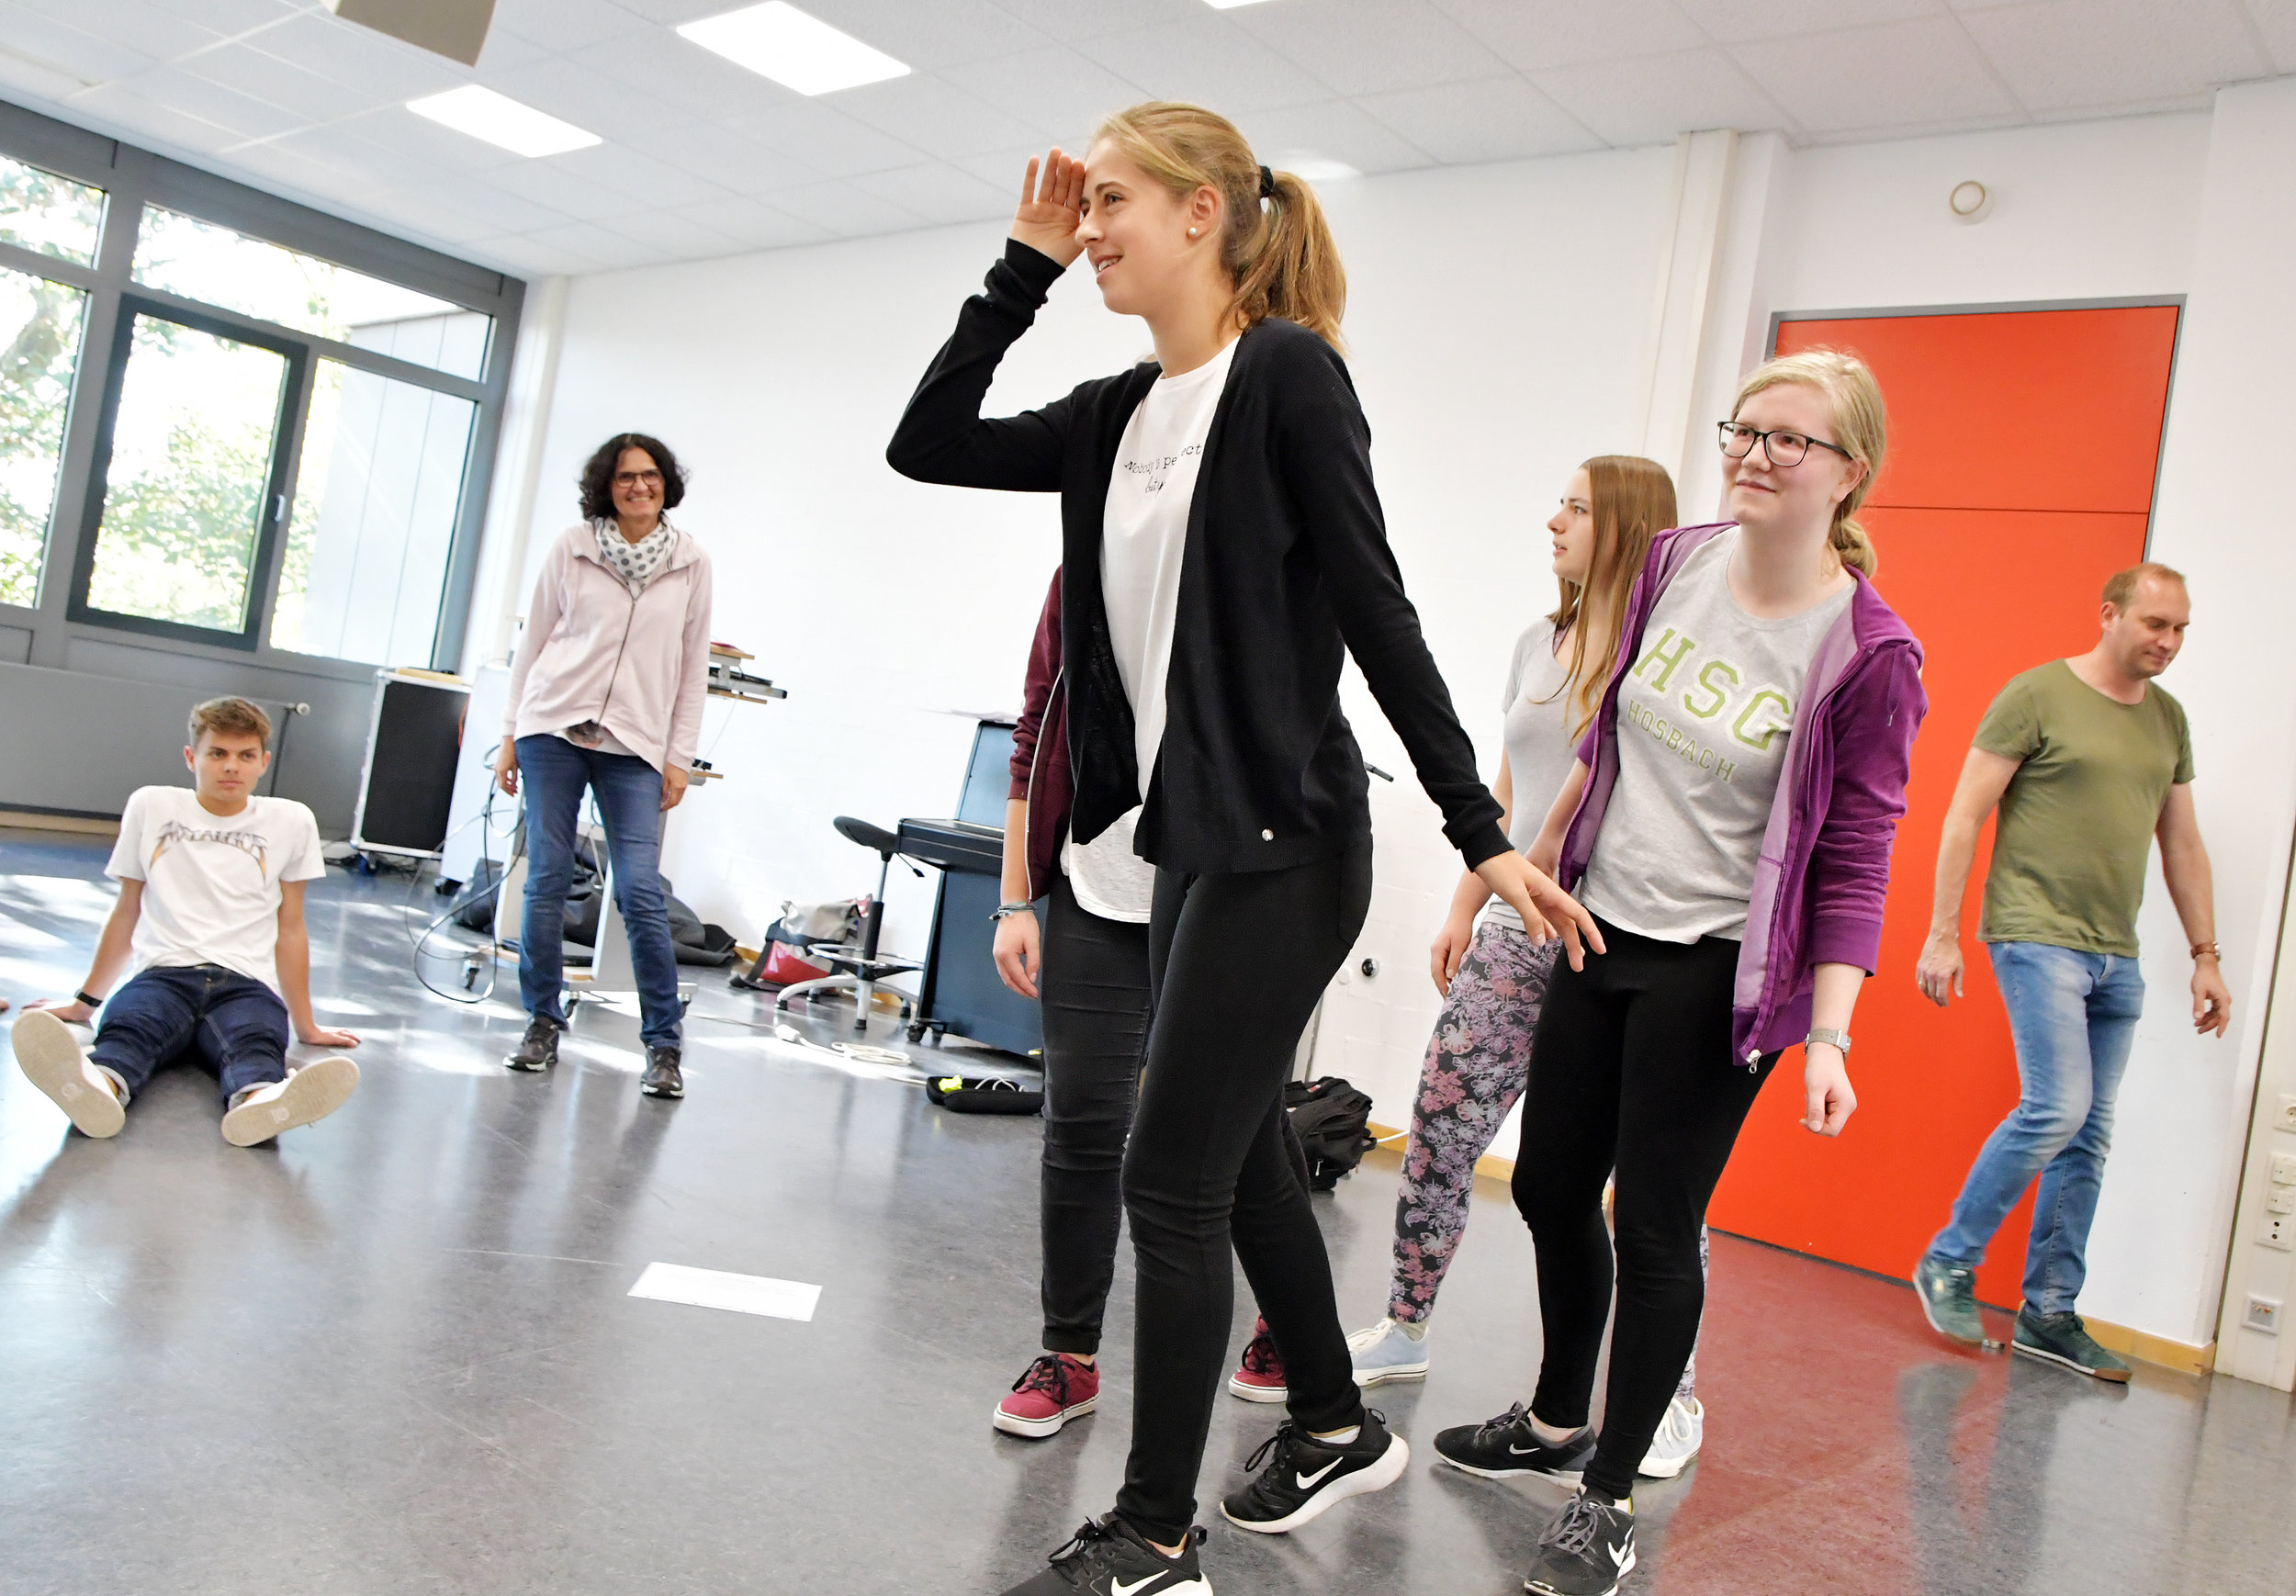 Foto: Medienhaus Main-Echo /  Petra Reith